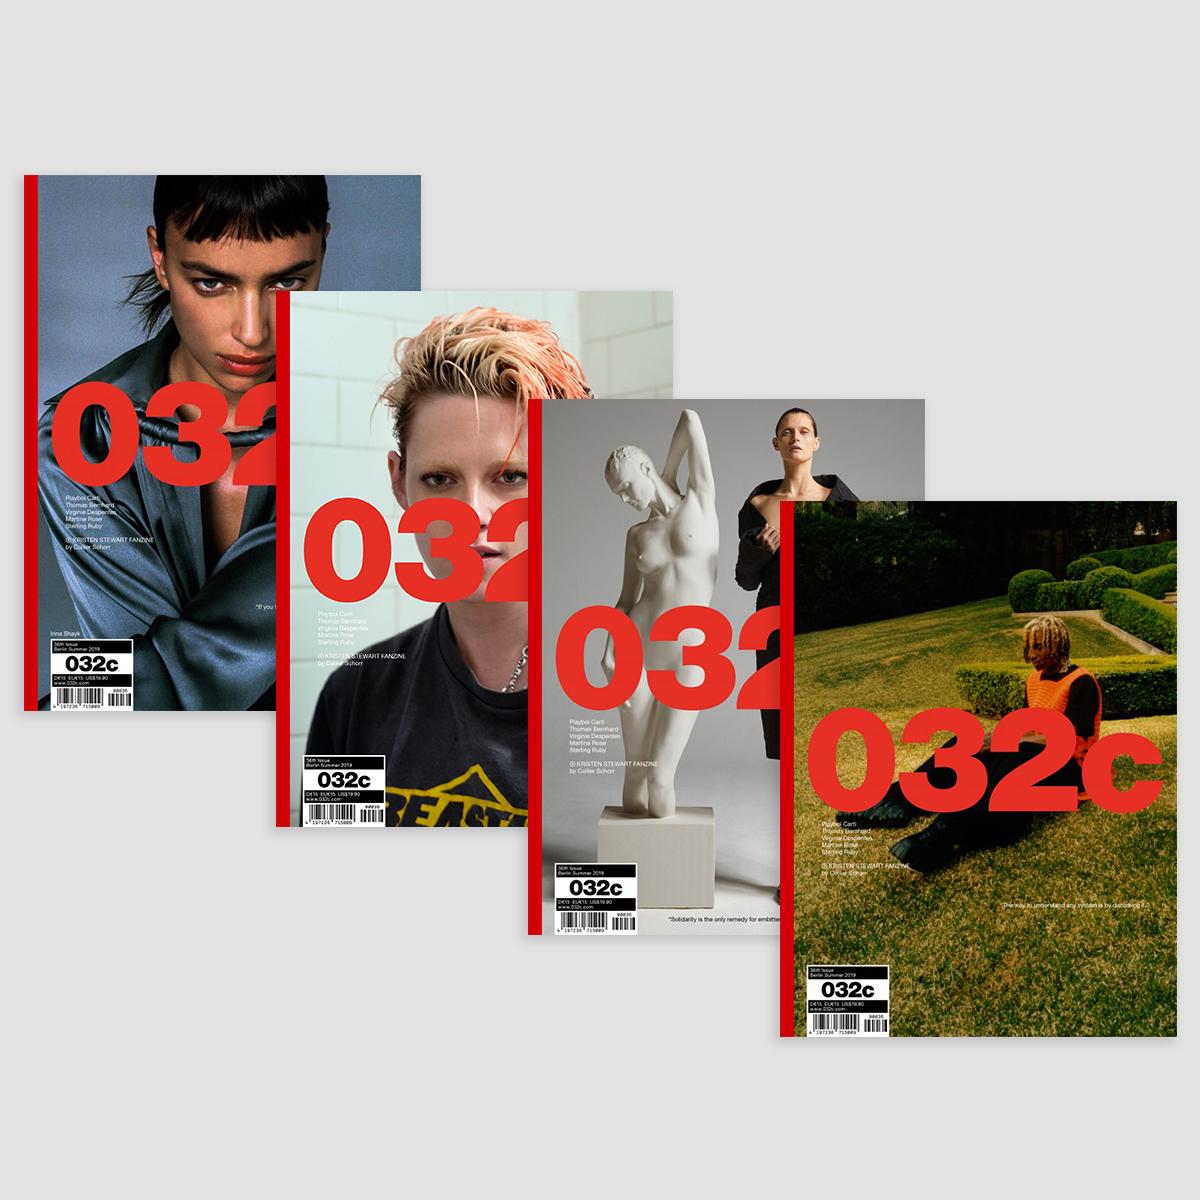 032_Issue36_Summer2019_WorkingOutLoud_01.jpg